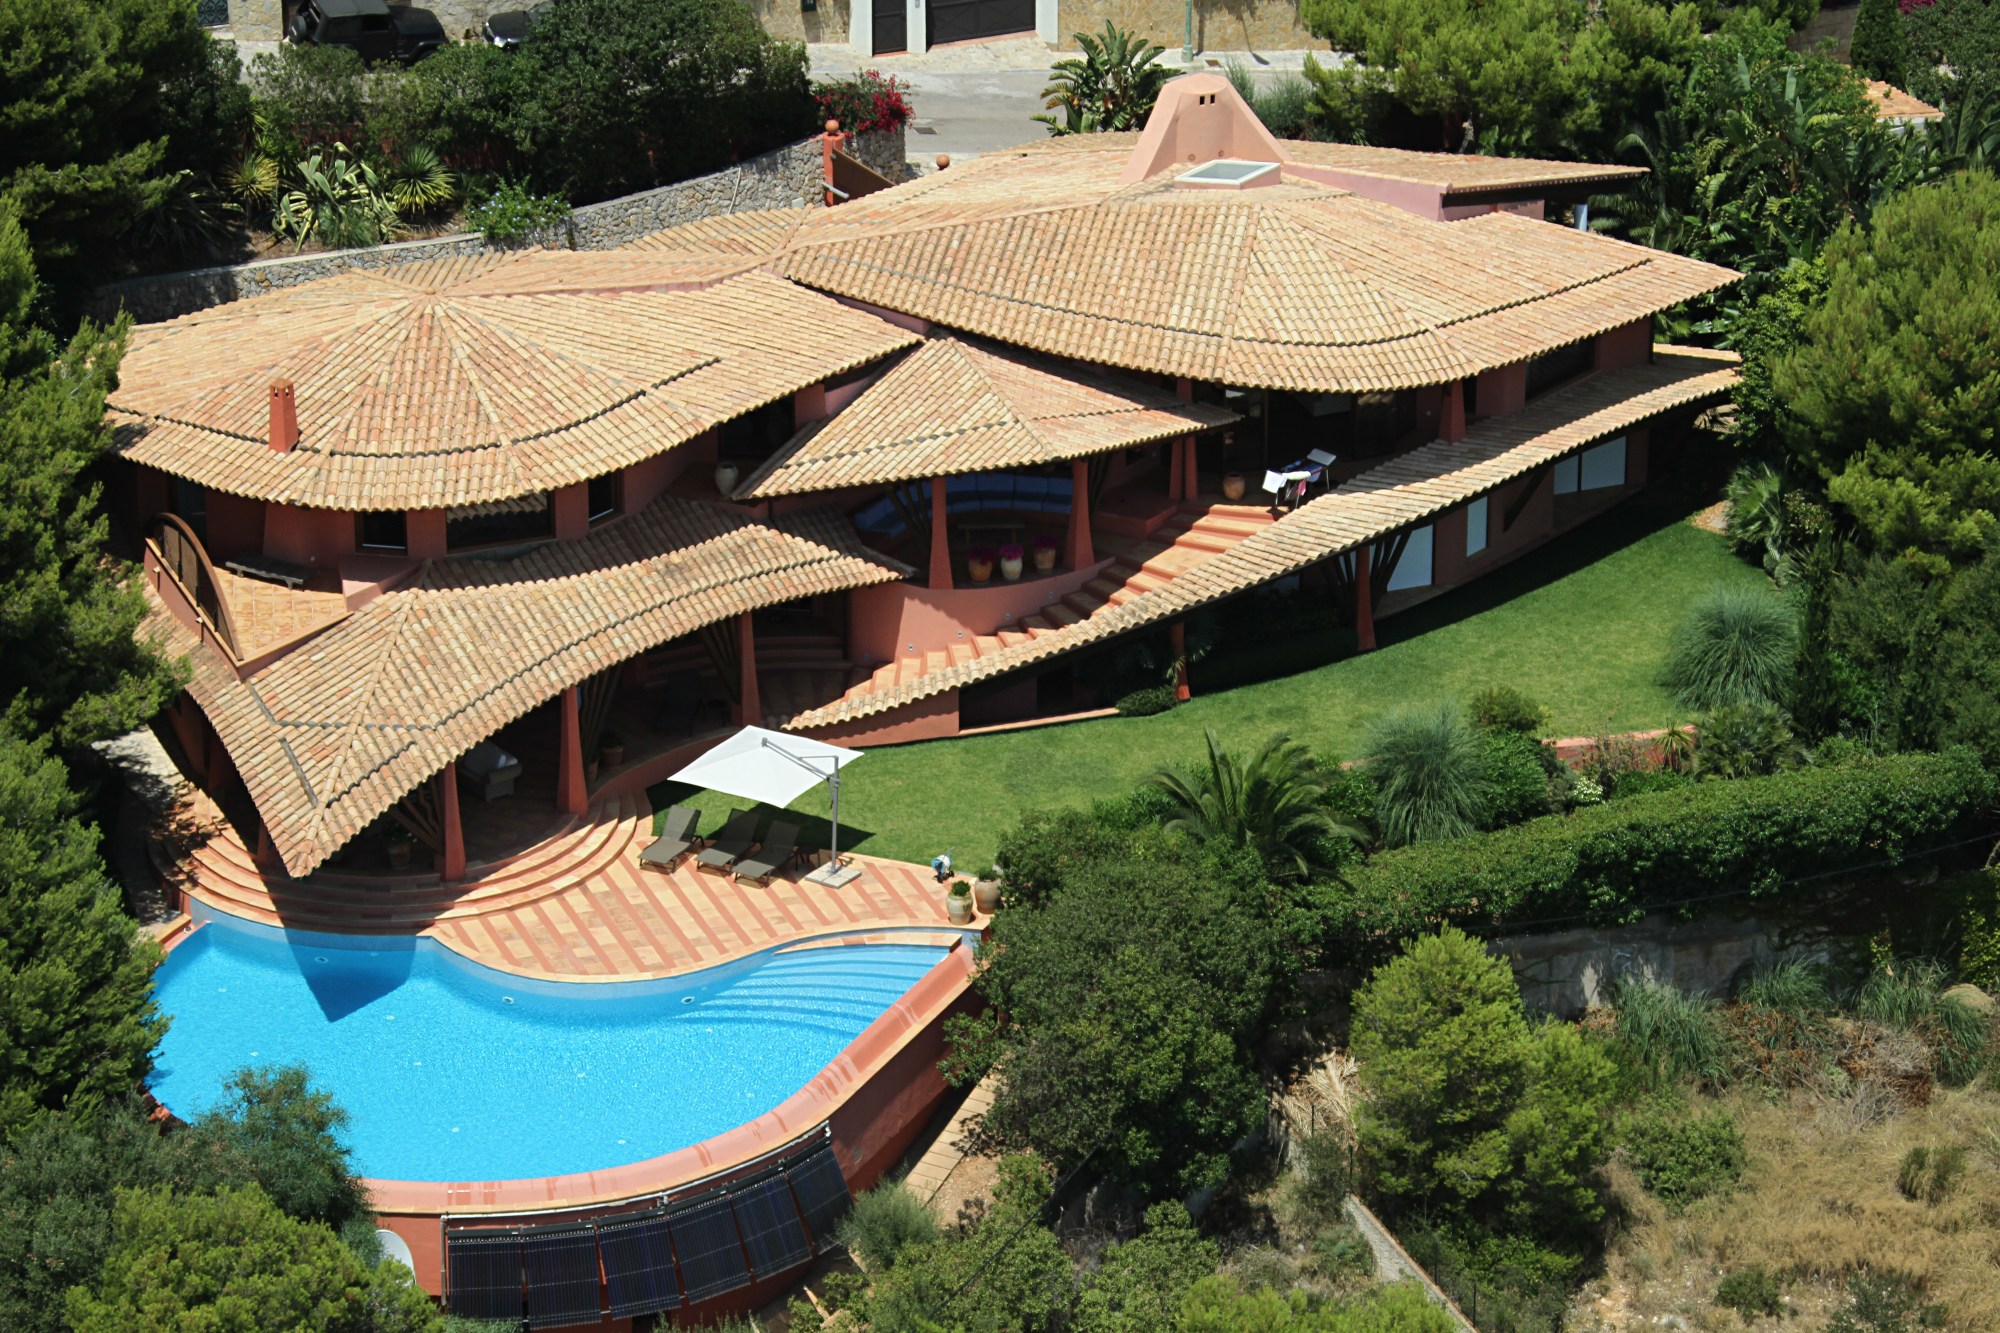 ARUB Aerials - Costa Blanes 01.jpg